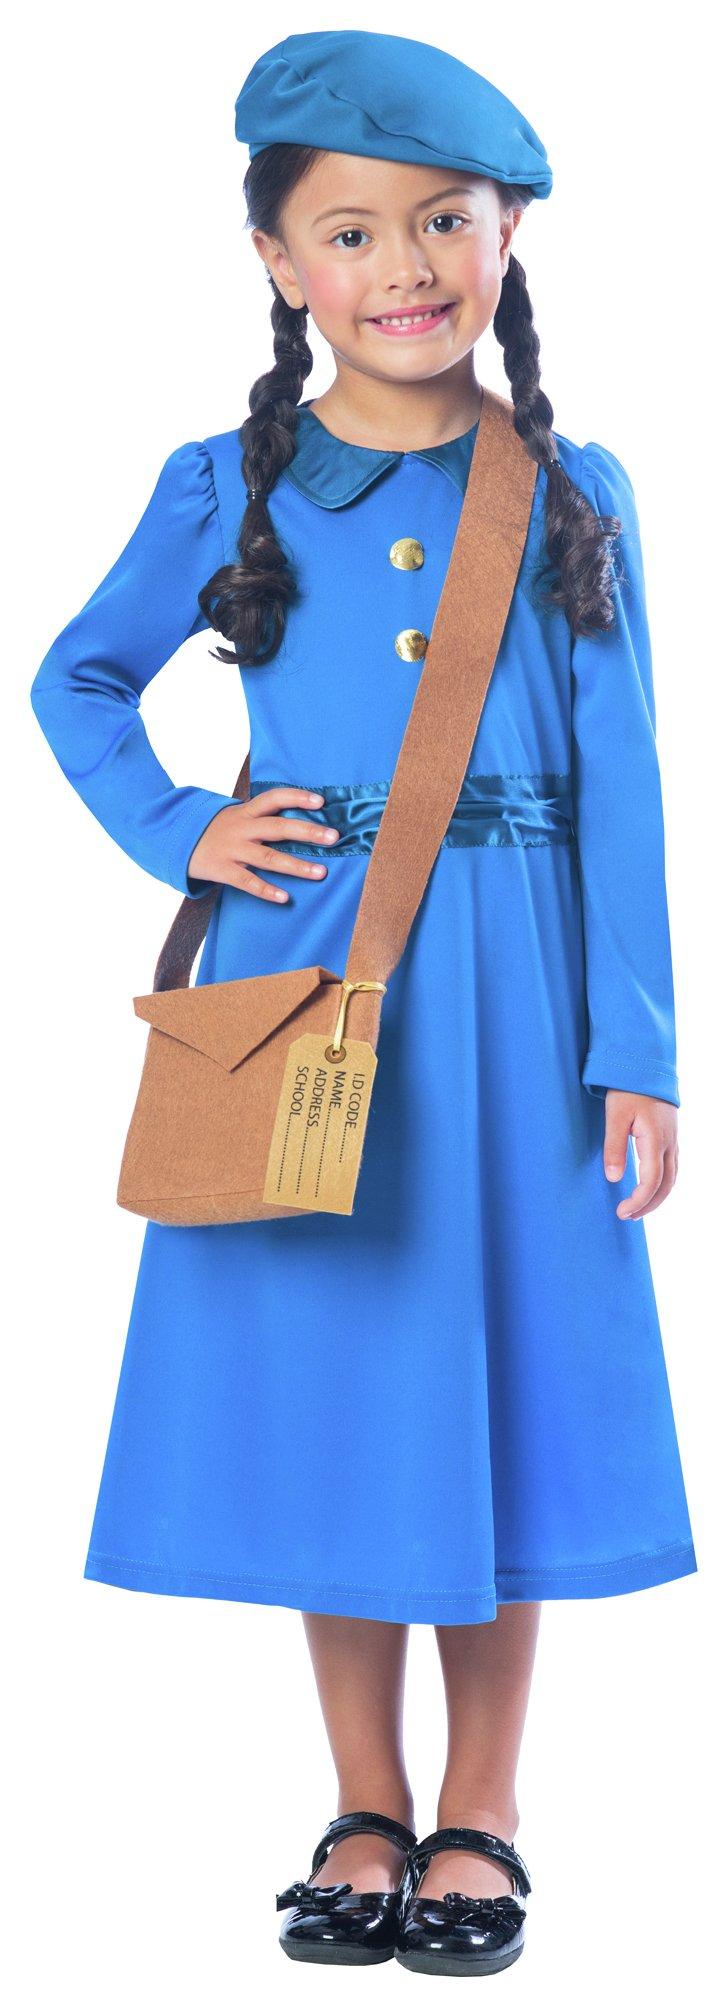 Image of Amscan Evacuee Girl Costume - 5 - 6 Years.